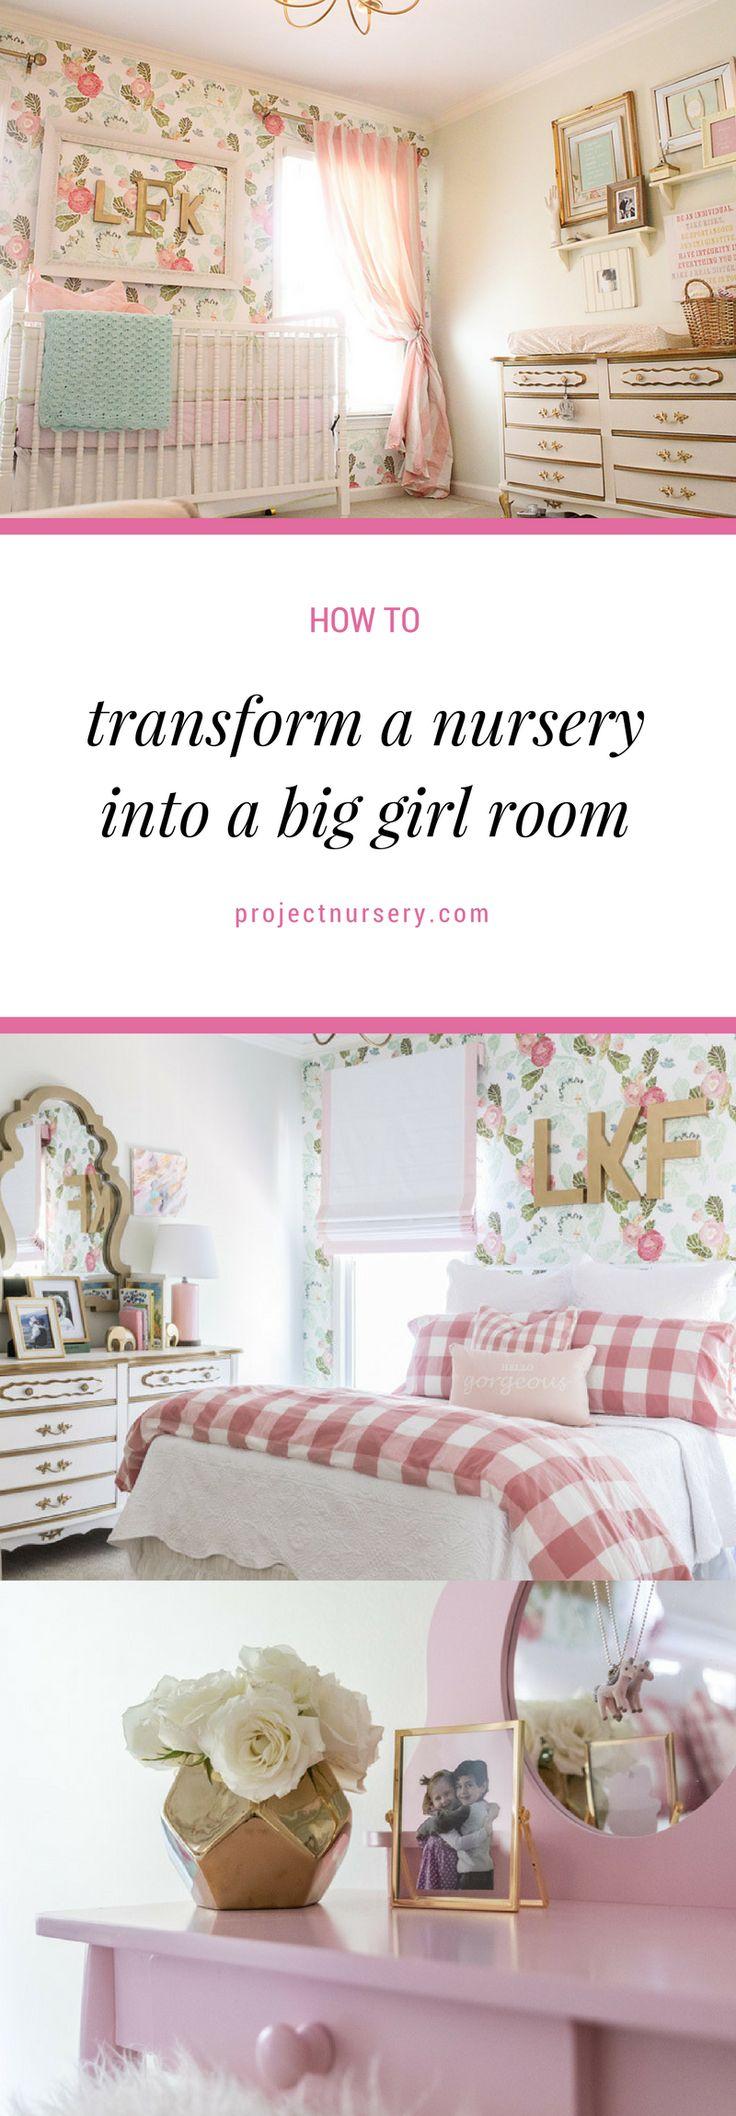 88 best pink kids room images on pinterest | pink kids, project